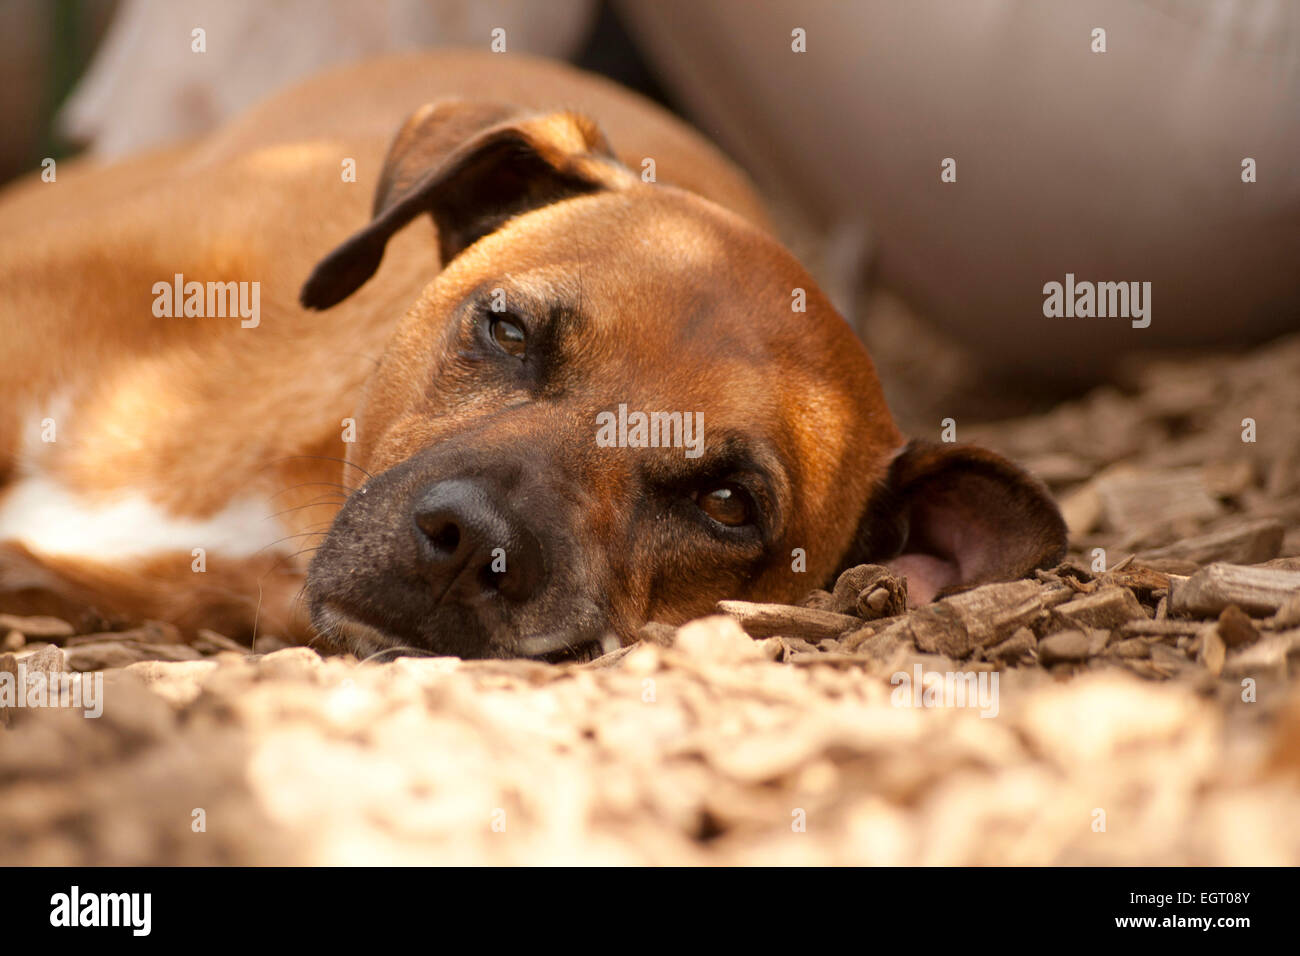 Sleeping Dog - Stock Image